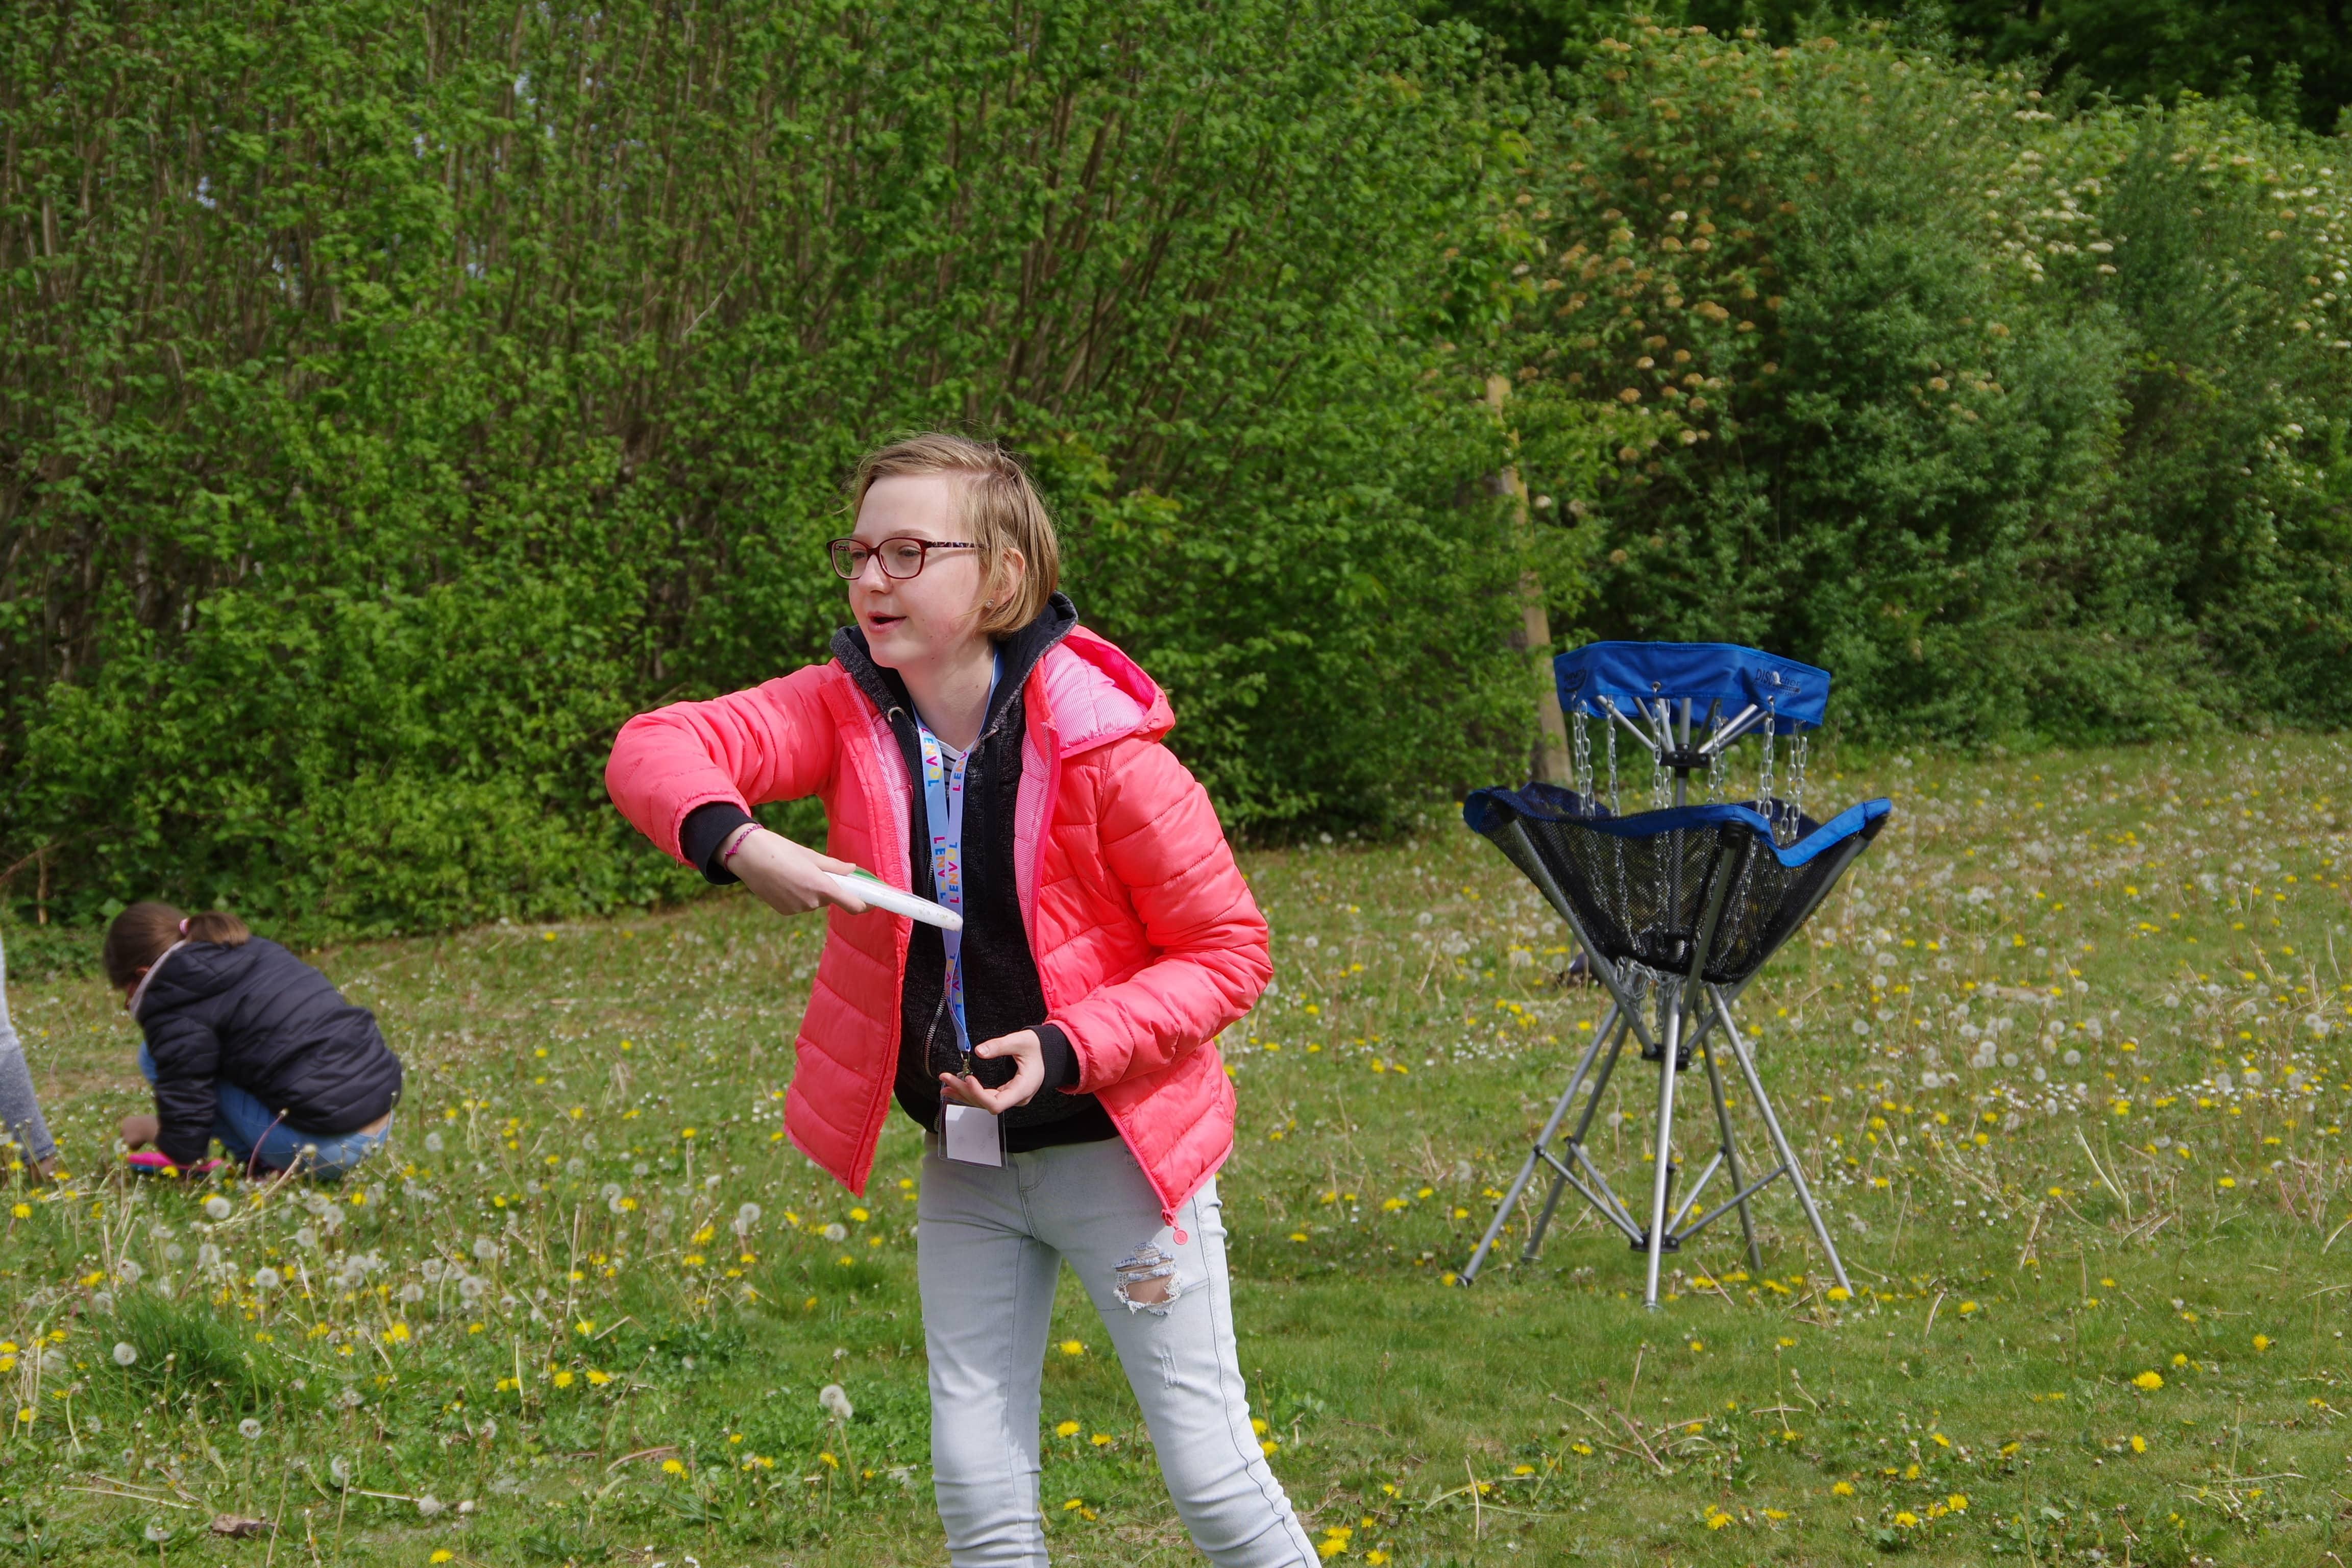 enfant jouant au frisbee